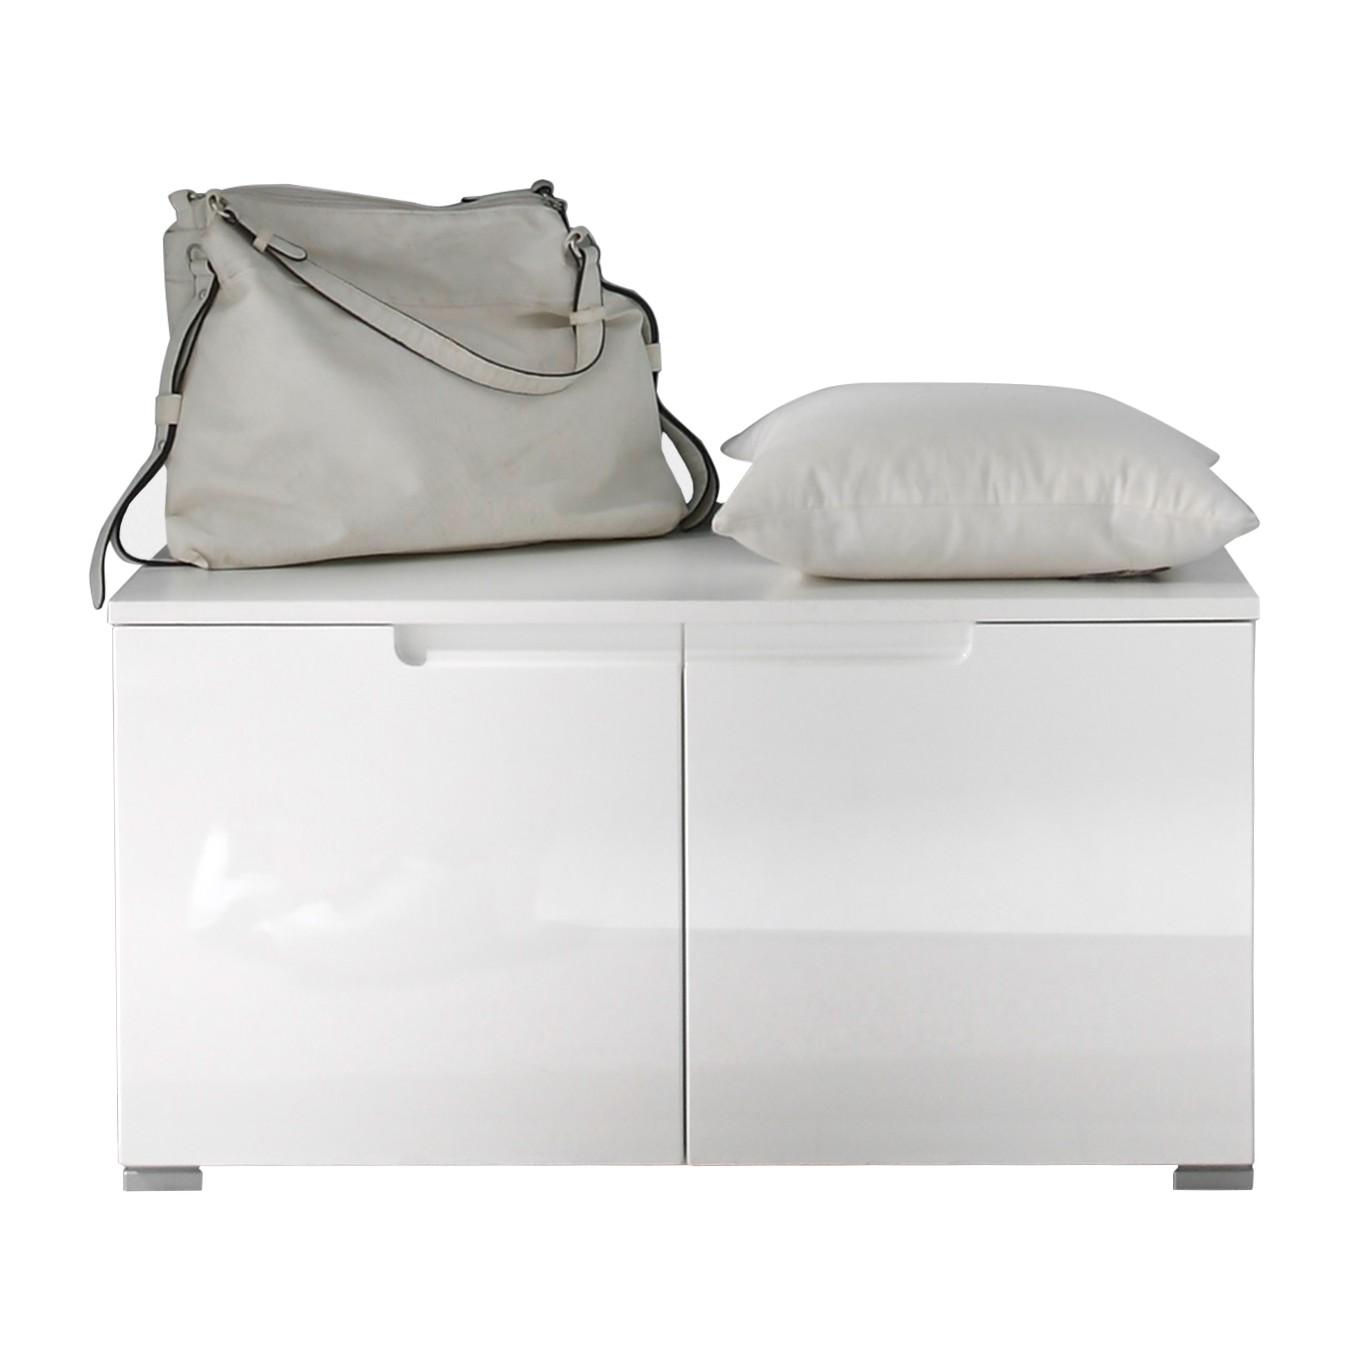 Home 24 - Banc de vestibule larado - blanc brillant /, roomscape